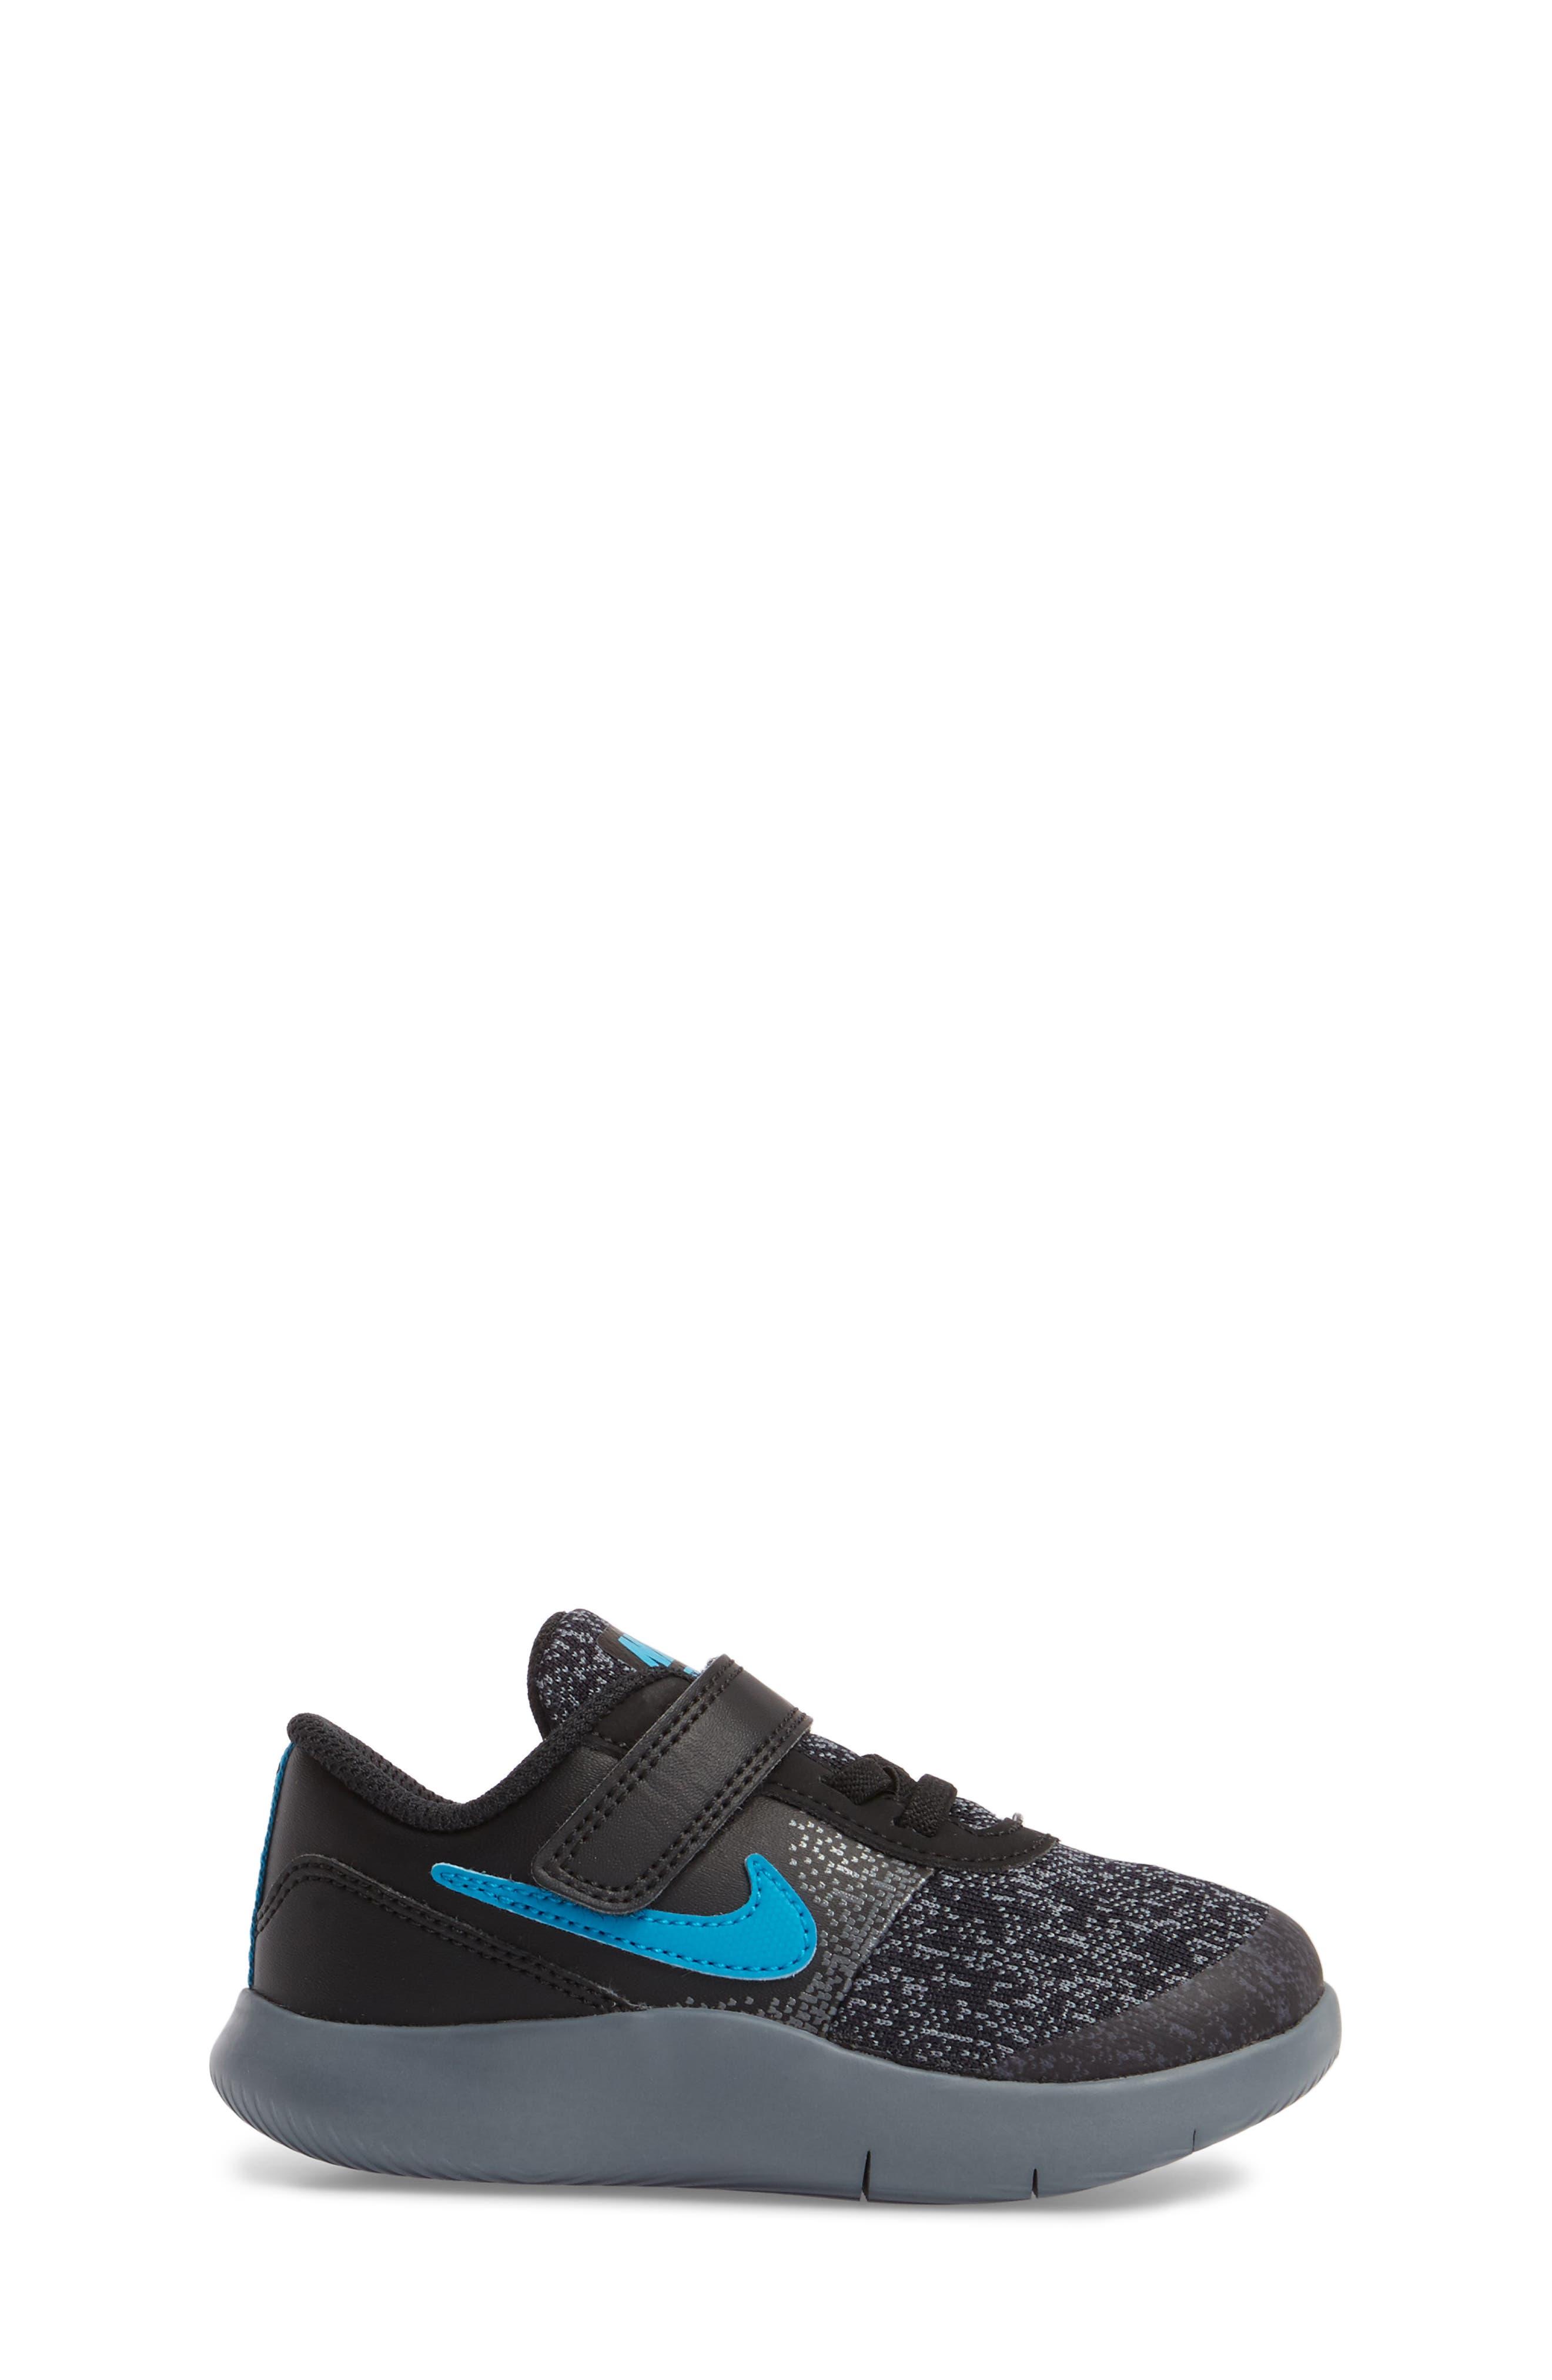 Alternate Image 3  - Nike Flex Contact Running Shoe (Baby, Walker, Toddler & Little Kid)